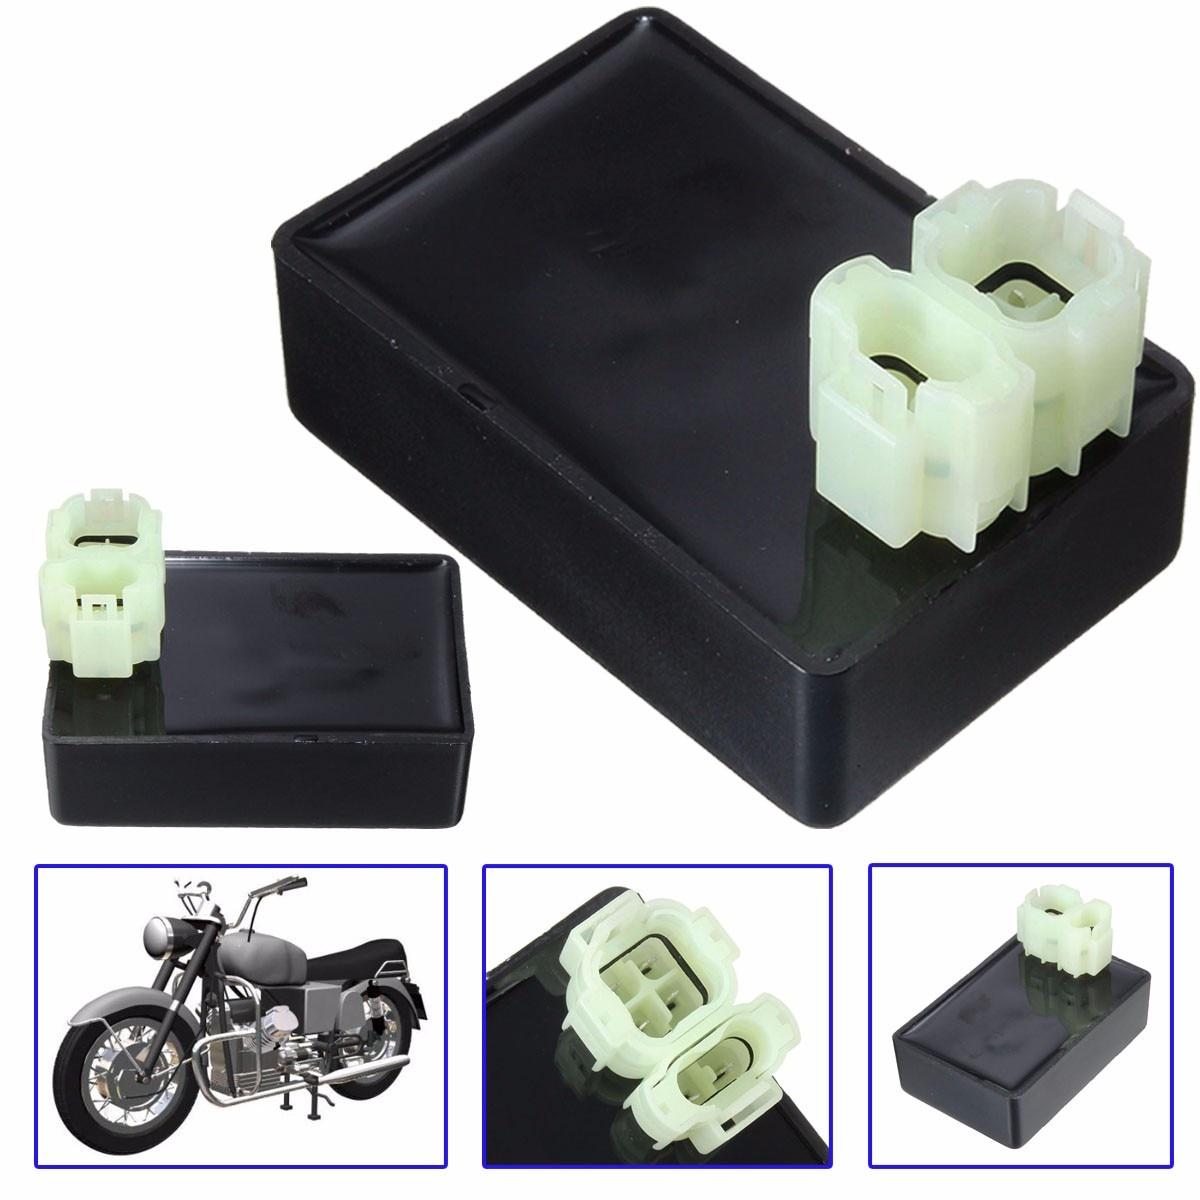 KIMISS Racing CDI Box Ignition For YAMAHA JOG Scooter Moped 2 Stroke 50CC 90CC